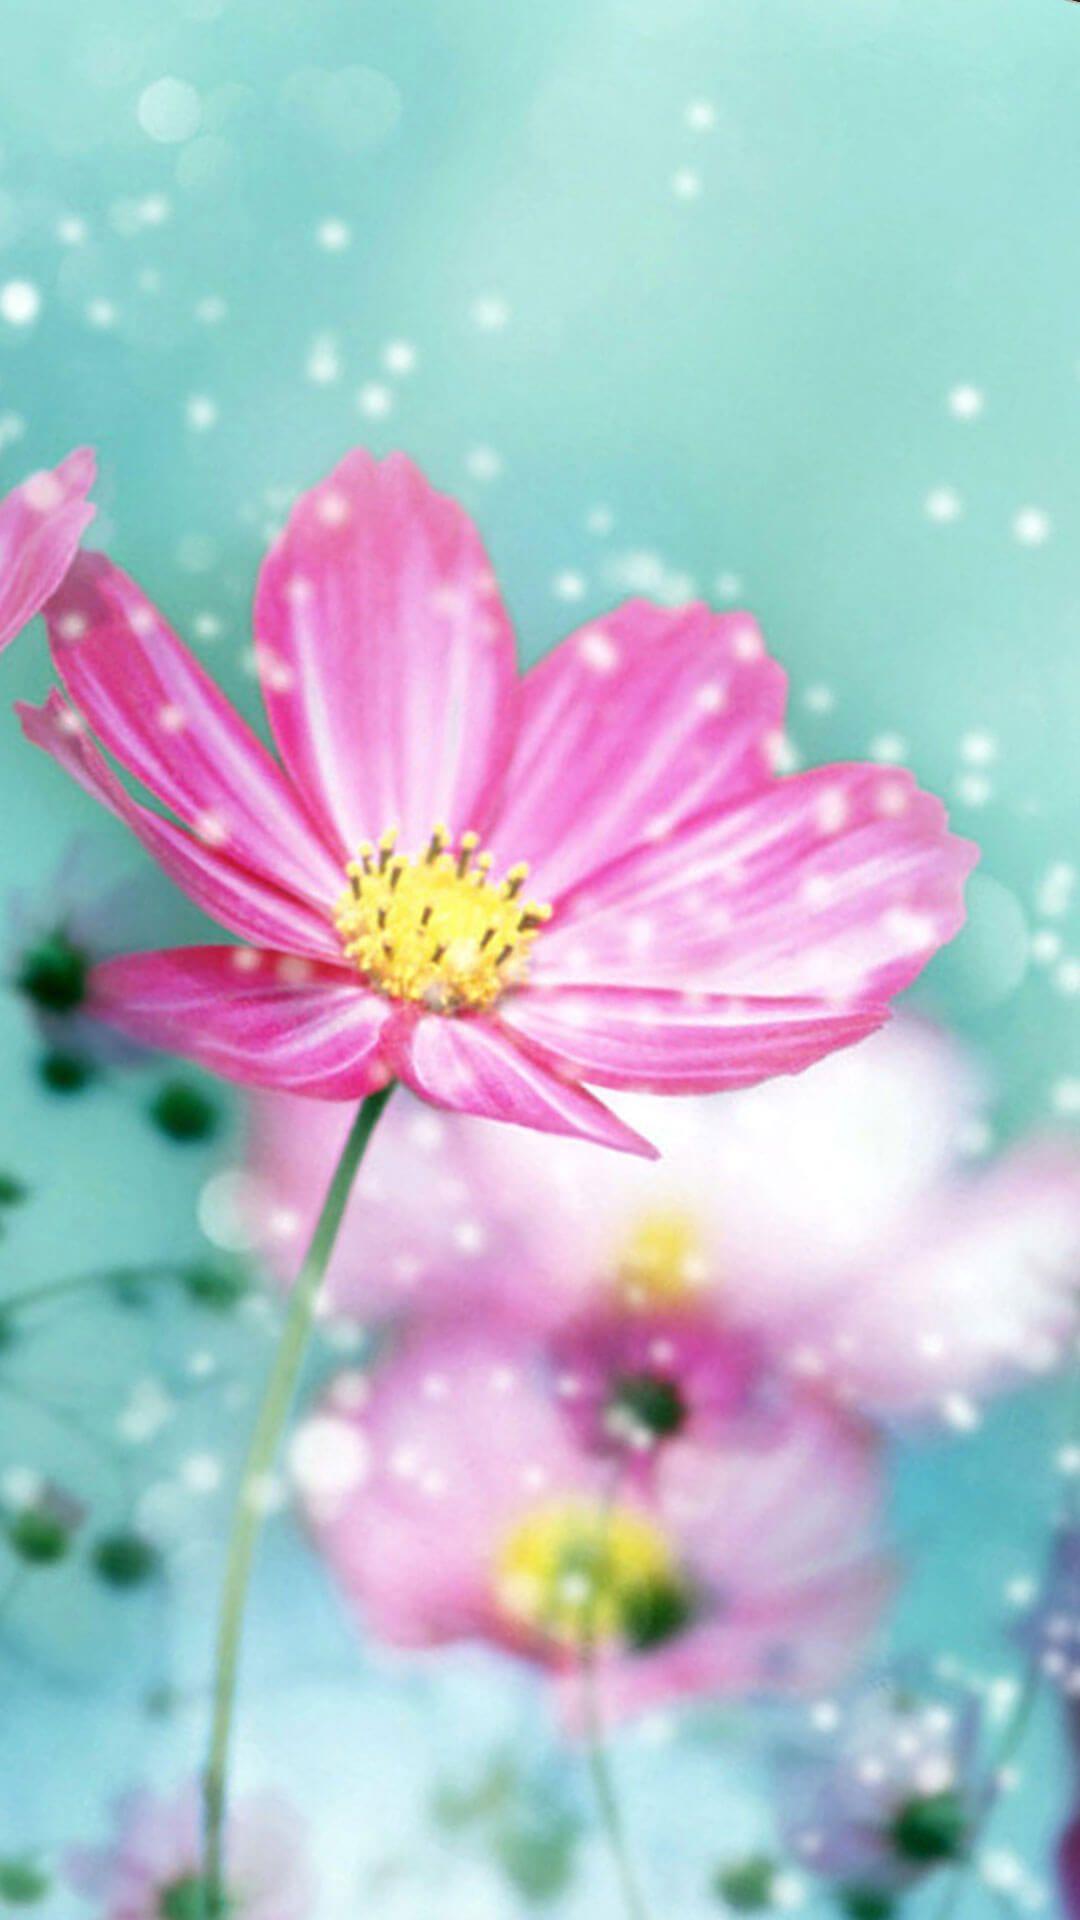 Iphone 6 wallpaper tumblr flowers - Spring Flower Iphone 6 Wallpaper Hd